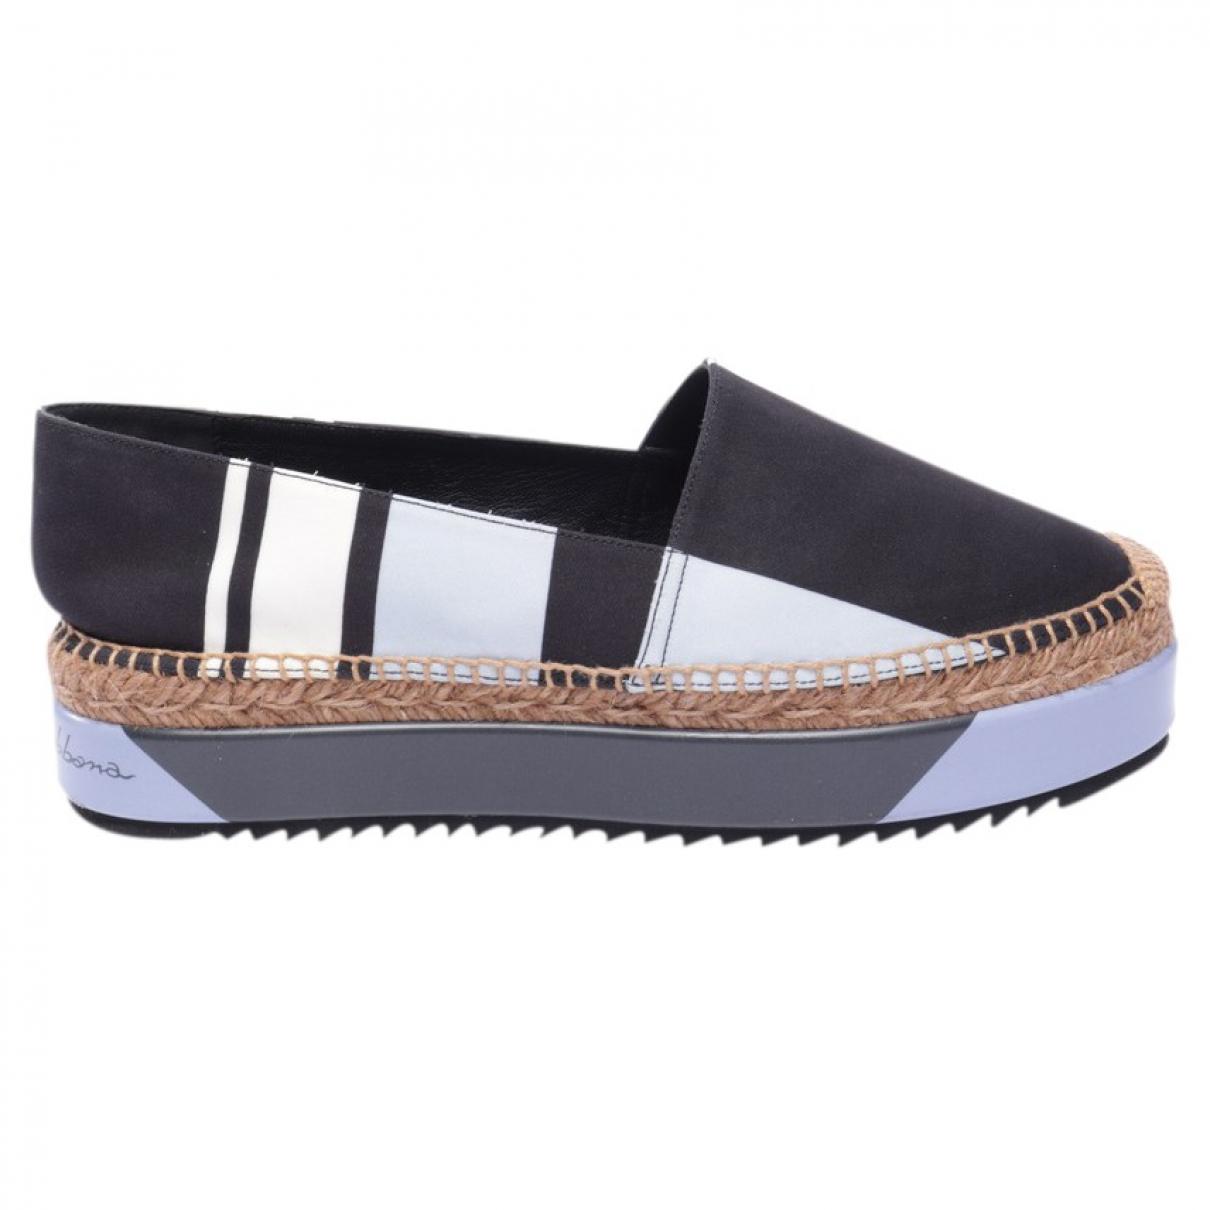 Dolce & Gabbana \N Sneakers in  Bunt Leder